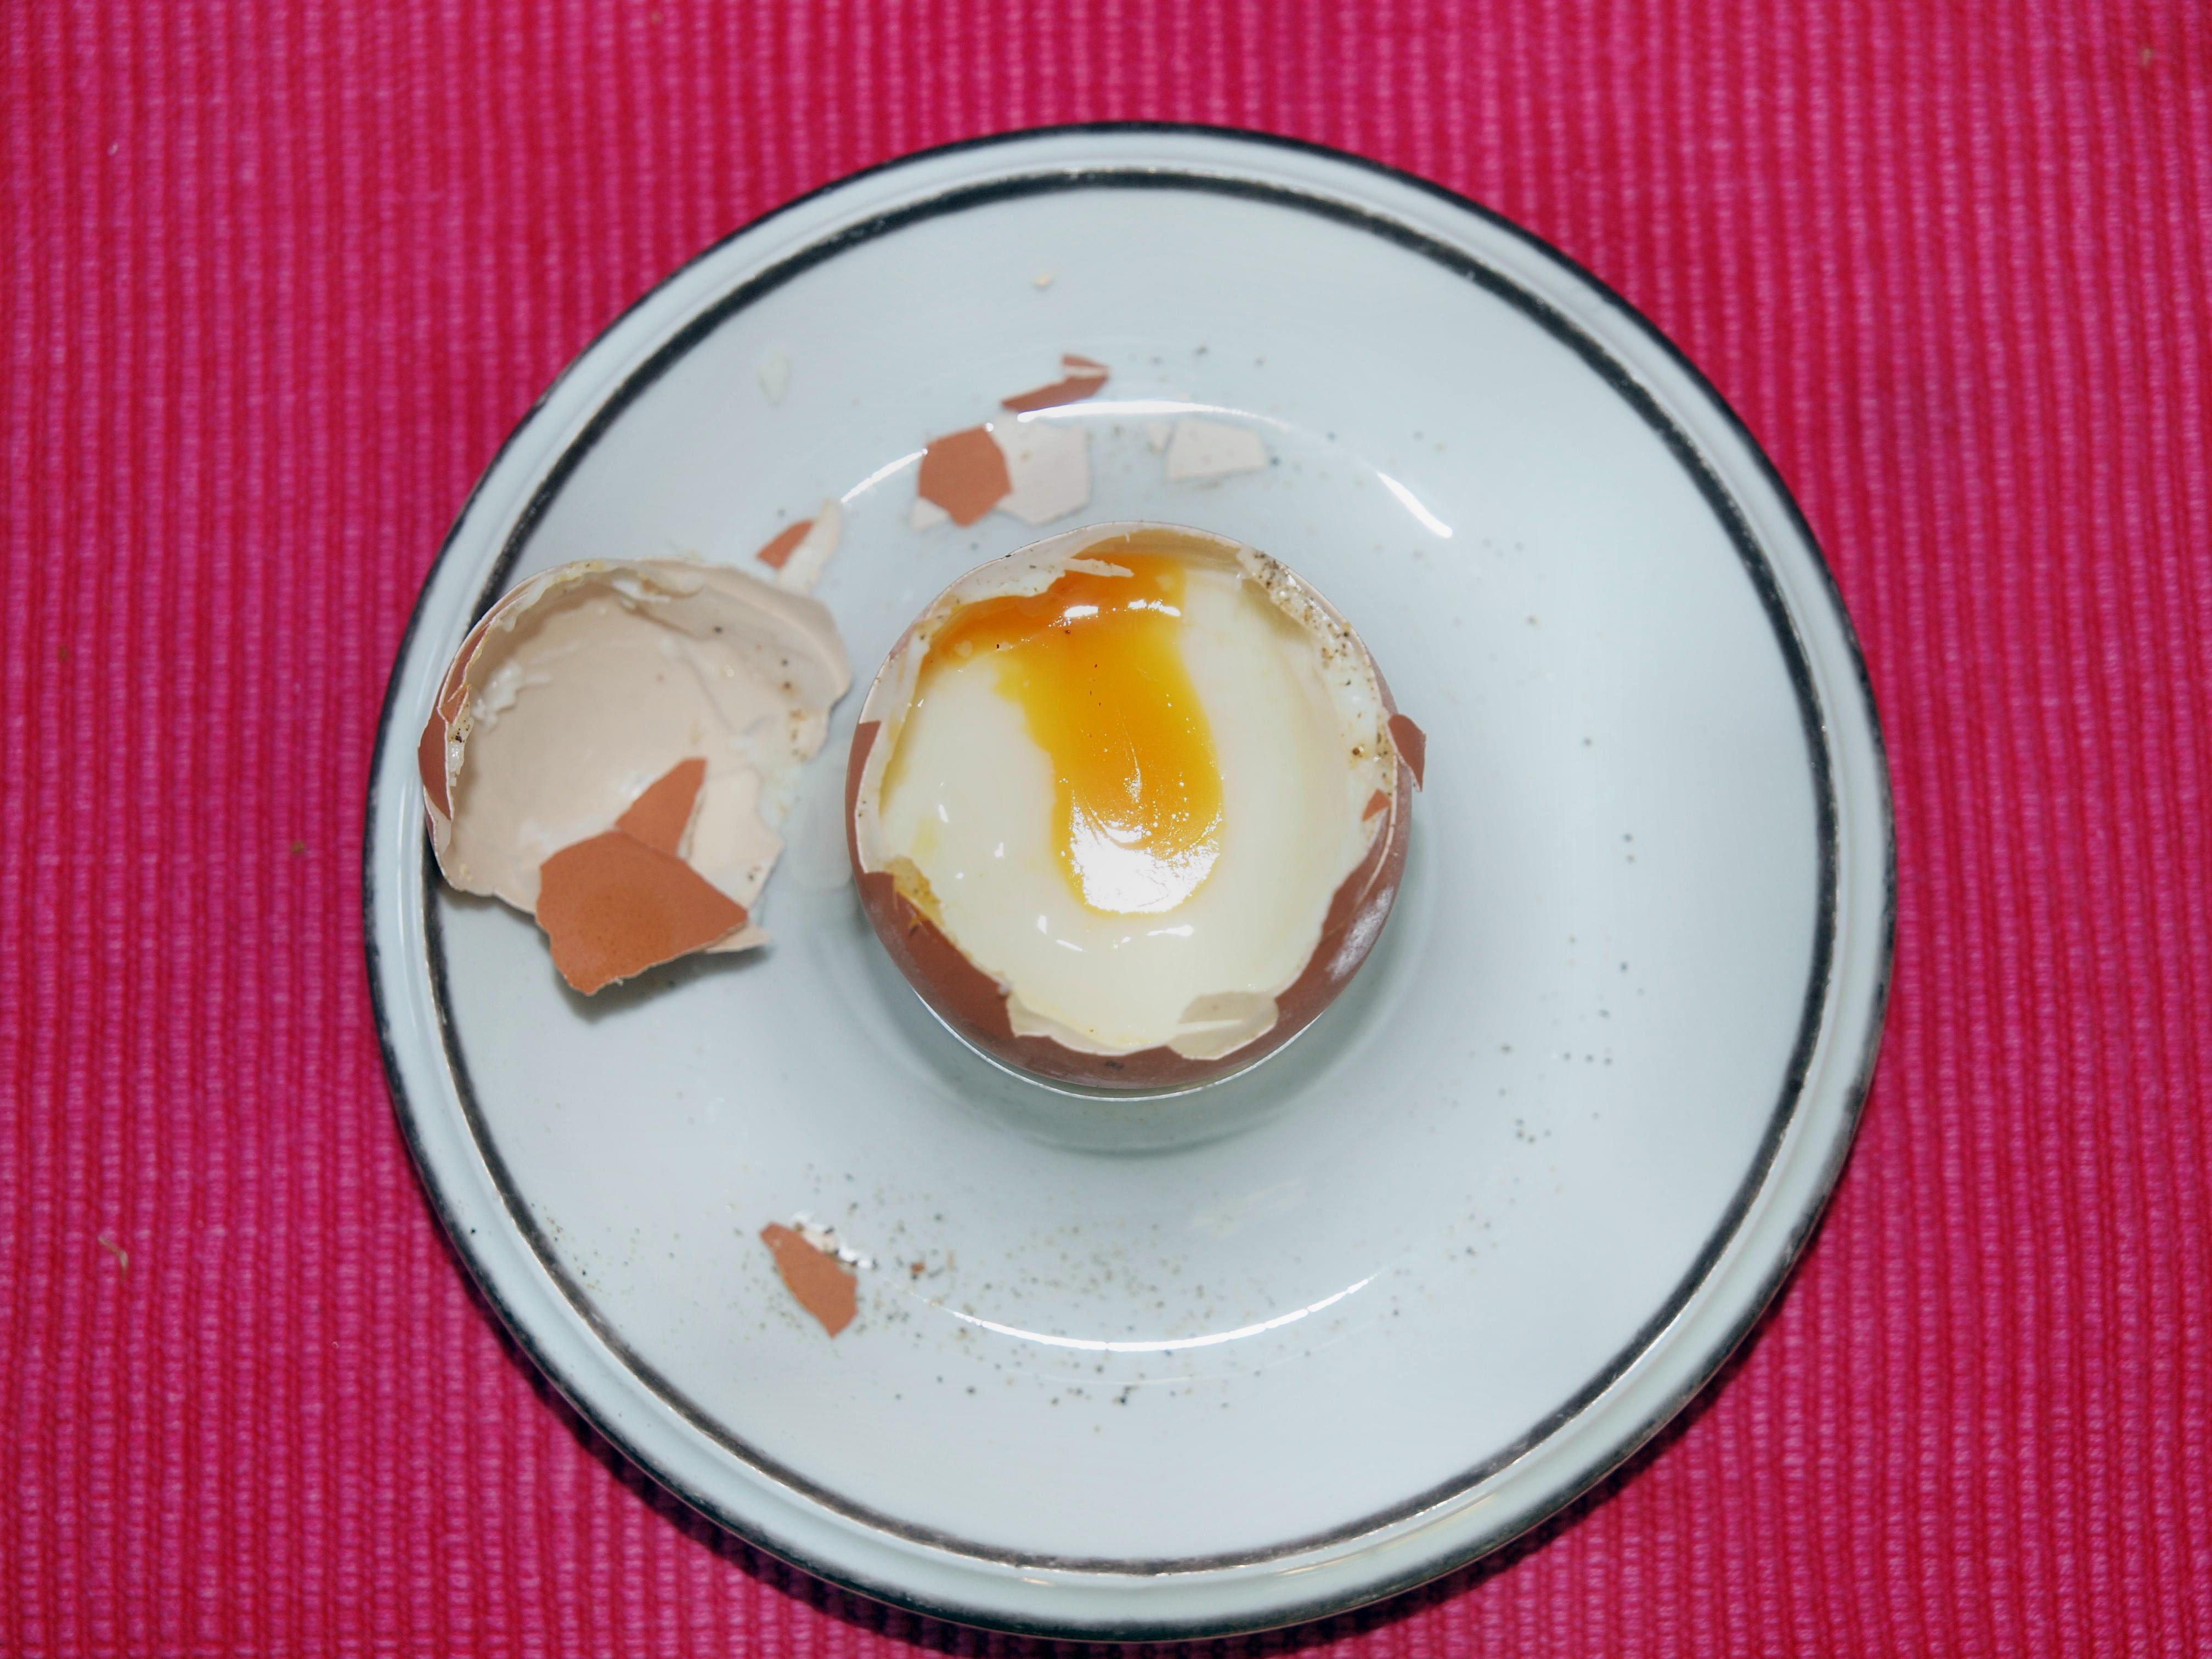 Eccentric-egg-3.jpeg